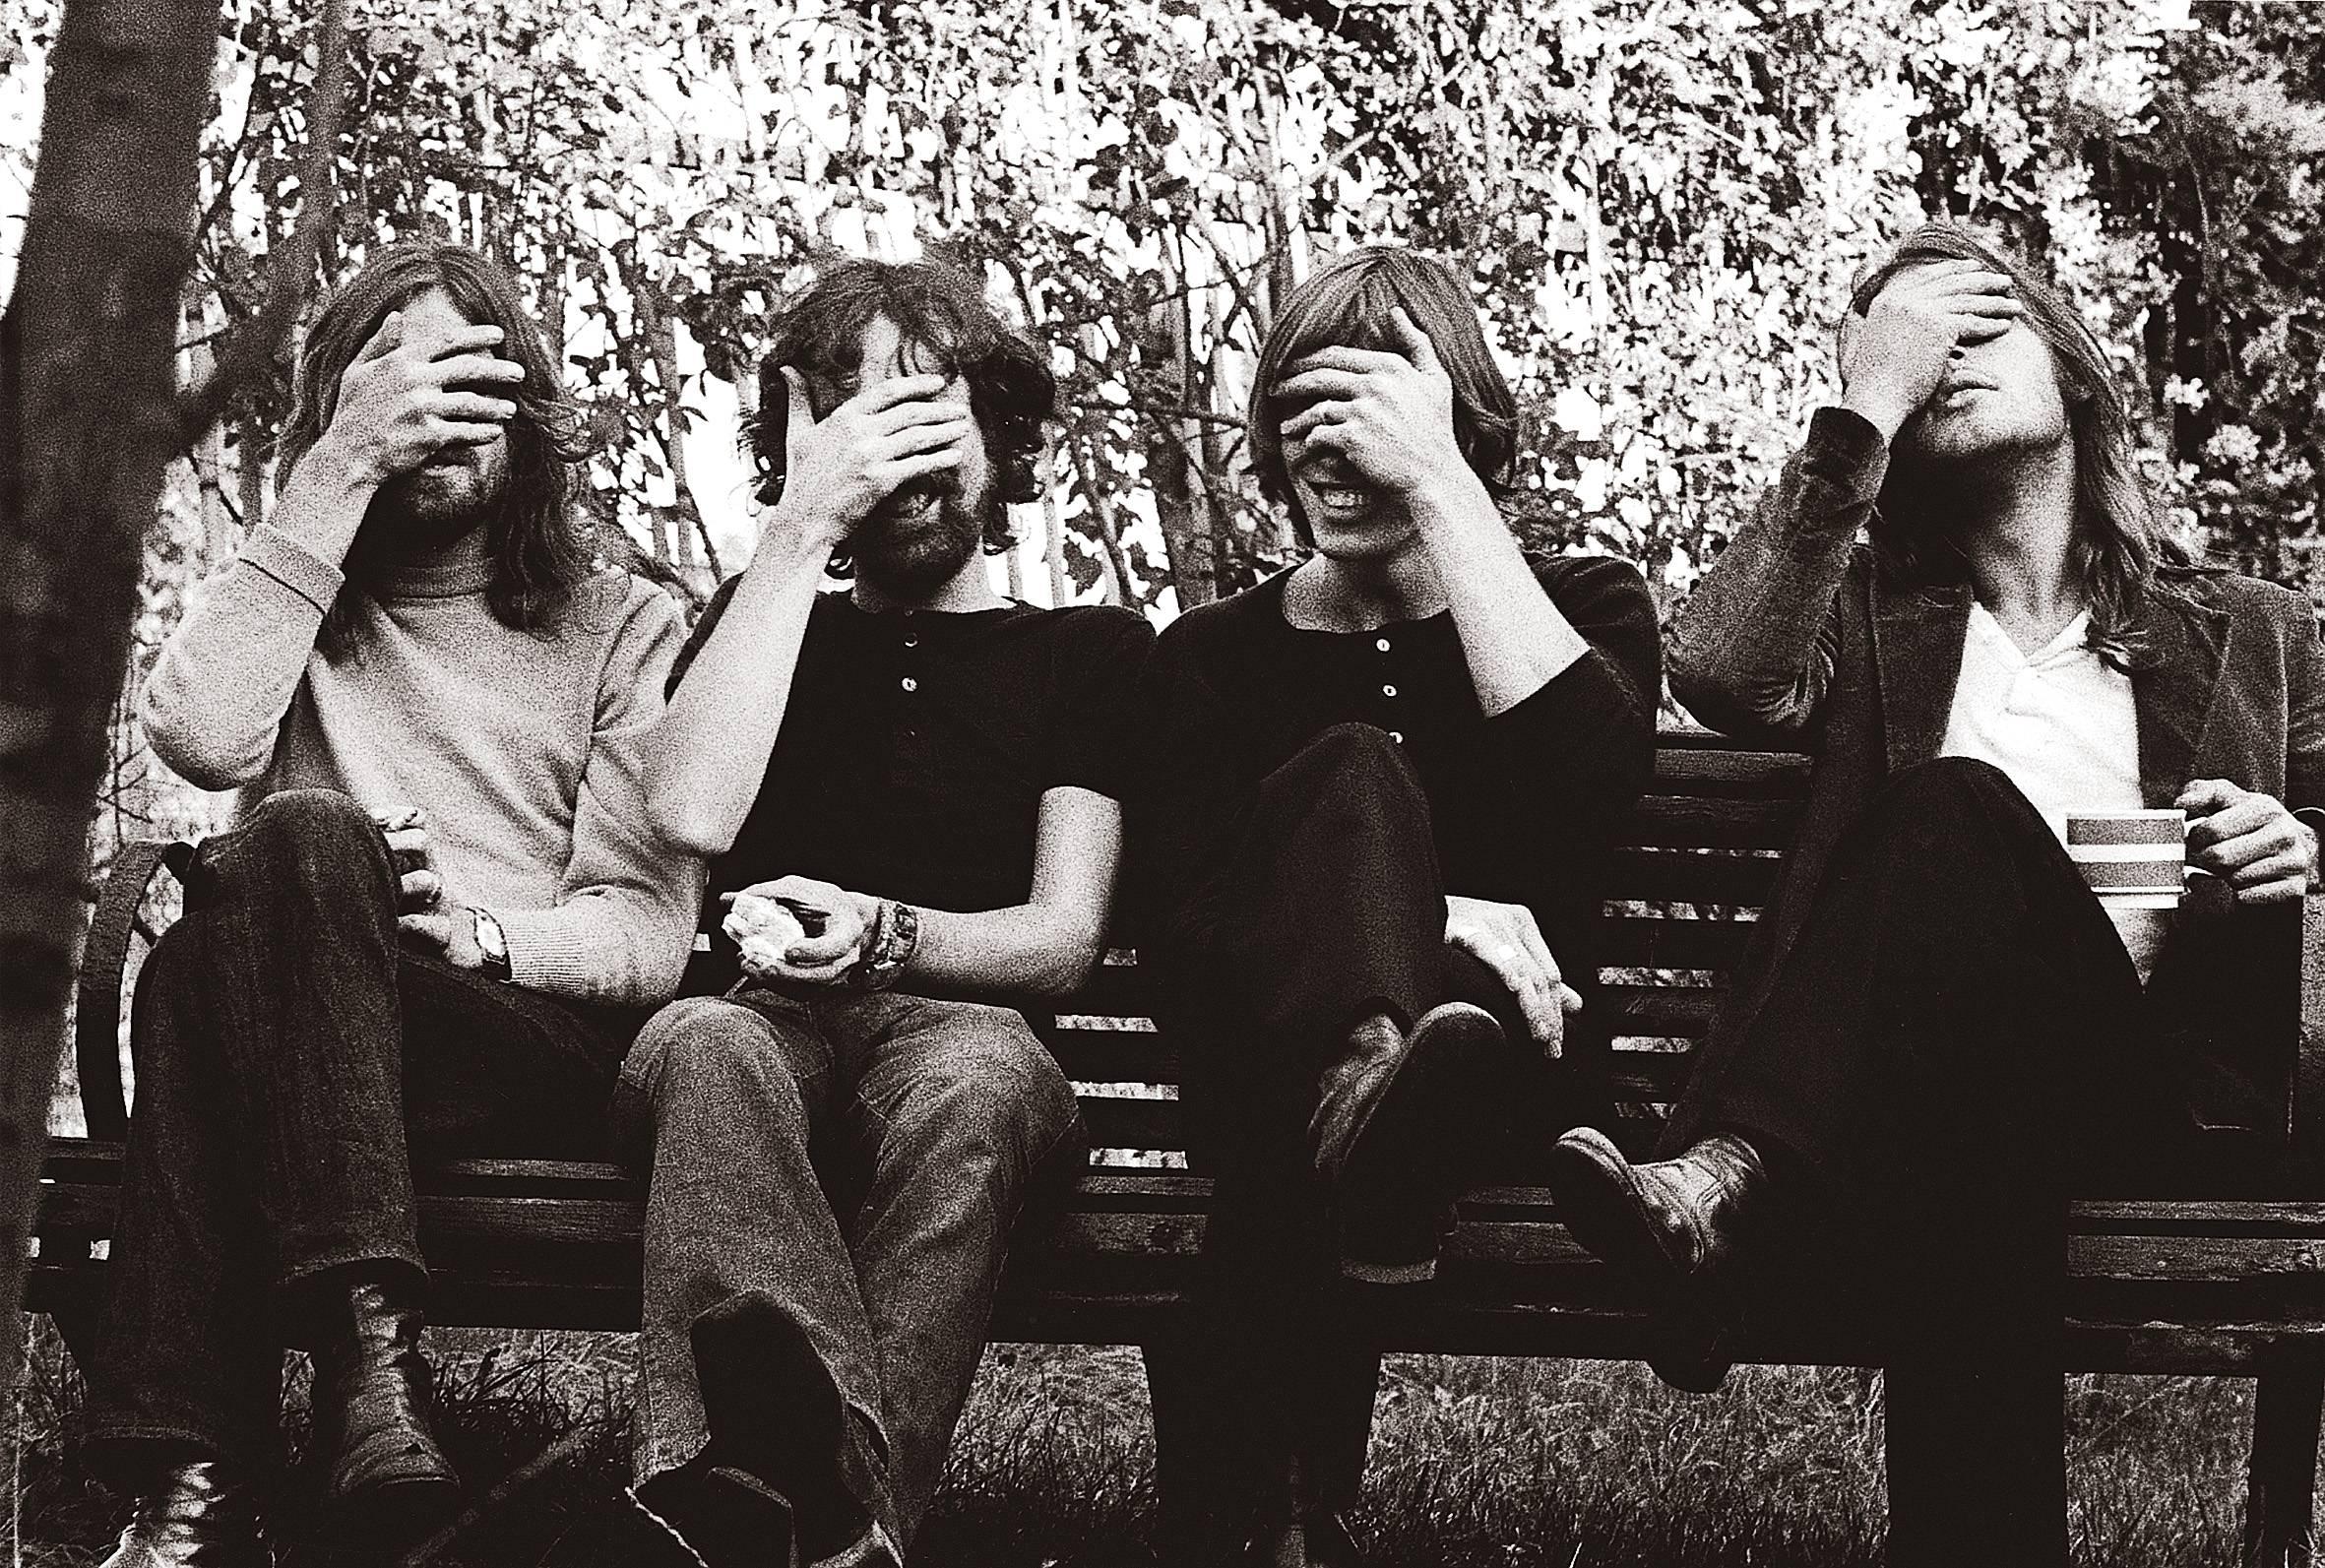 Google themes pink floyd - Pink Floyd Widescreen 2 Hd Wallpapers Topcelebrities